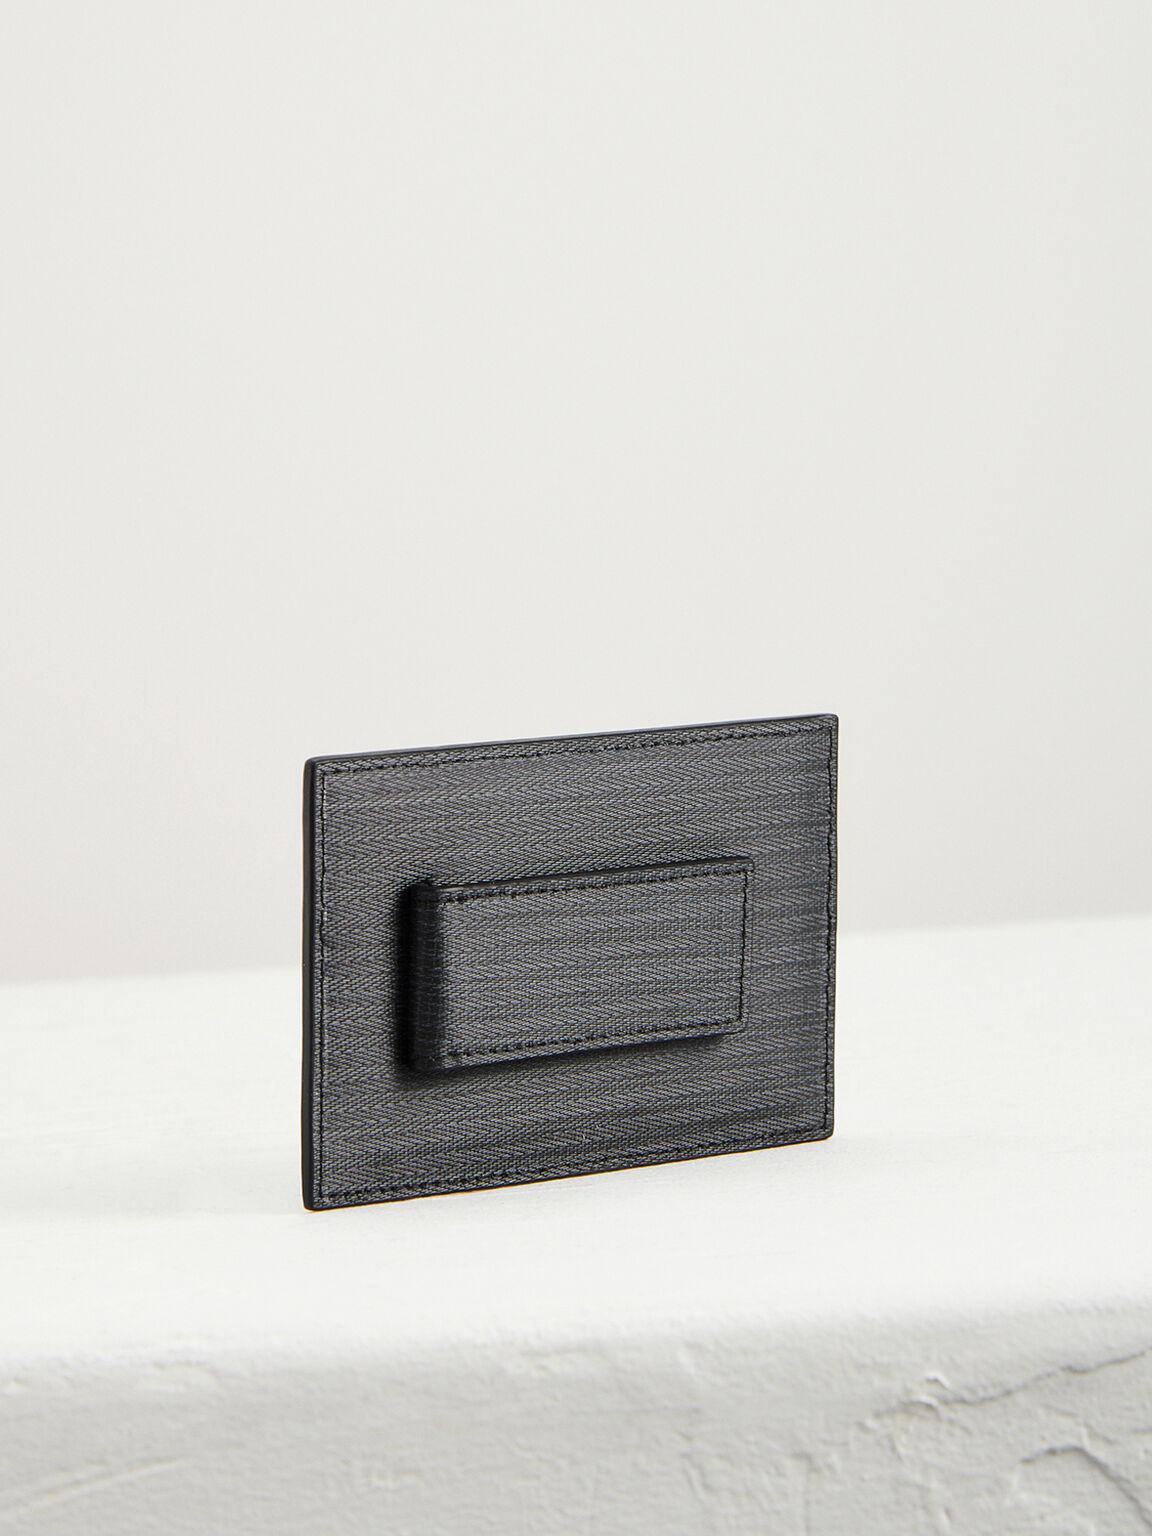 Leather Card Holder with Money Clip, Black, hi-res